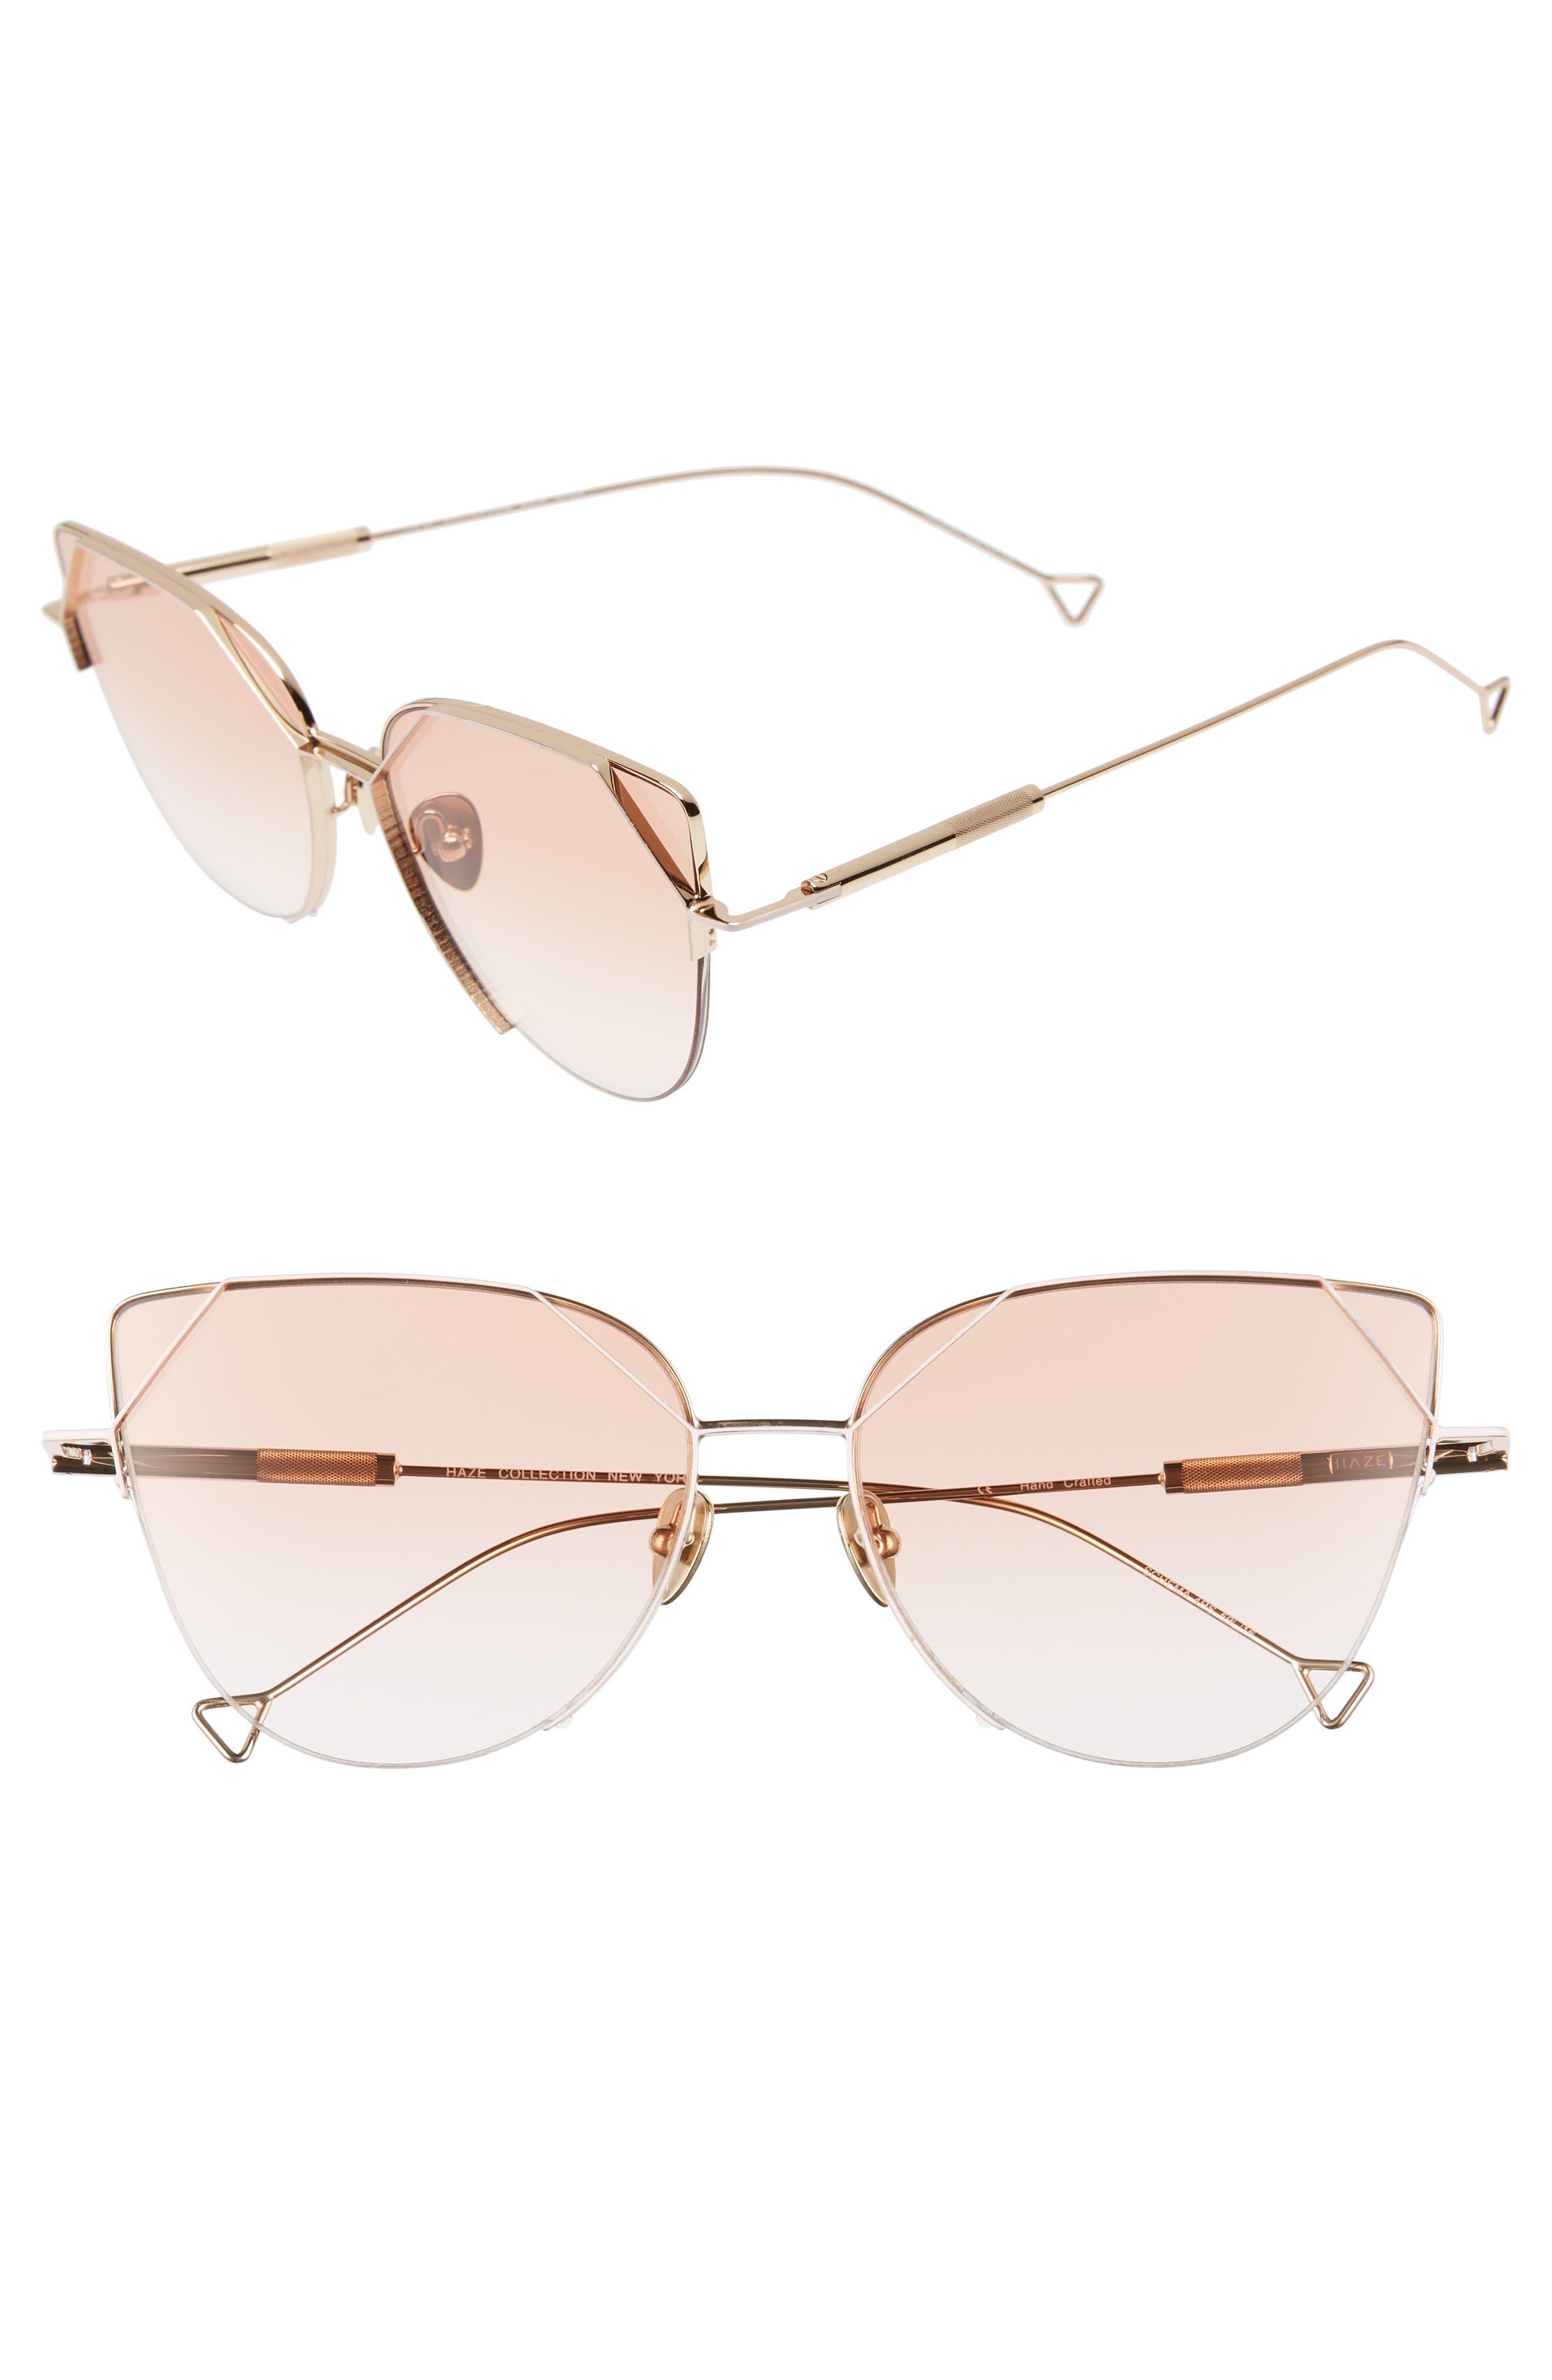 HAZE, The Schema 59mm Cat Eye Sunglasses, Main thumbnail 1, color, NUDE